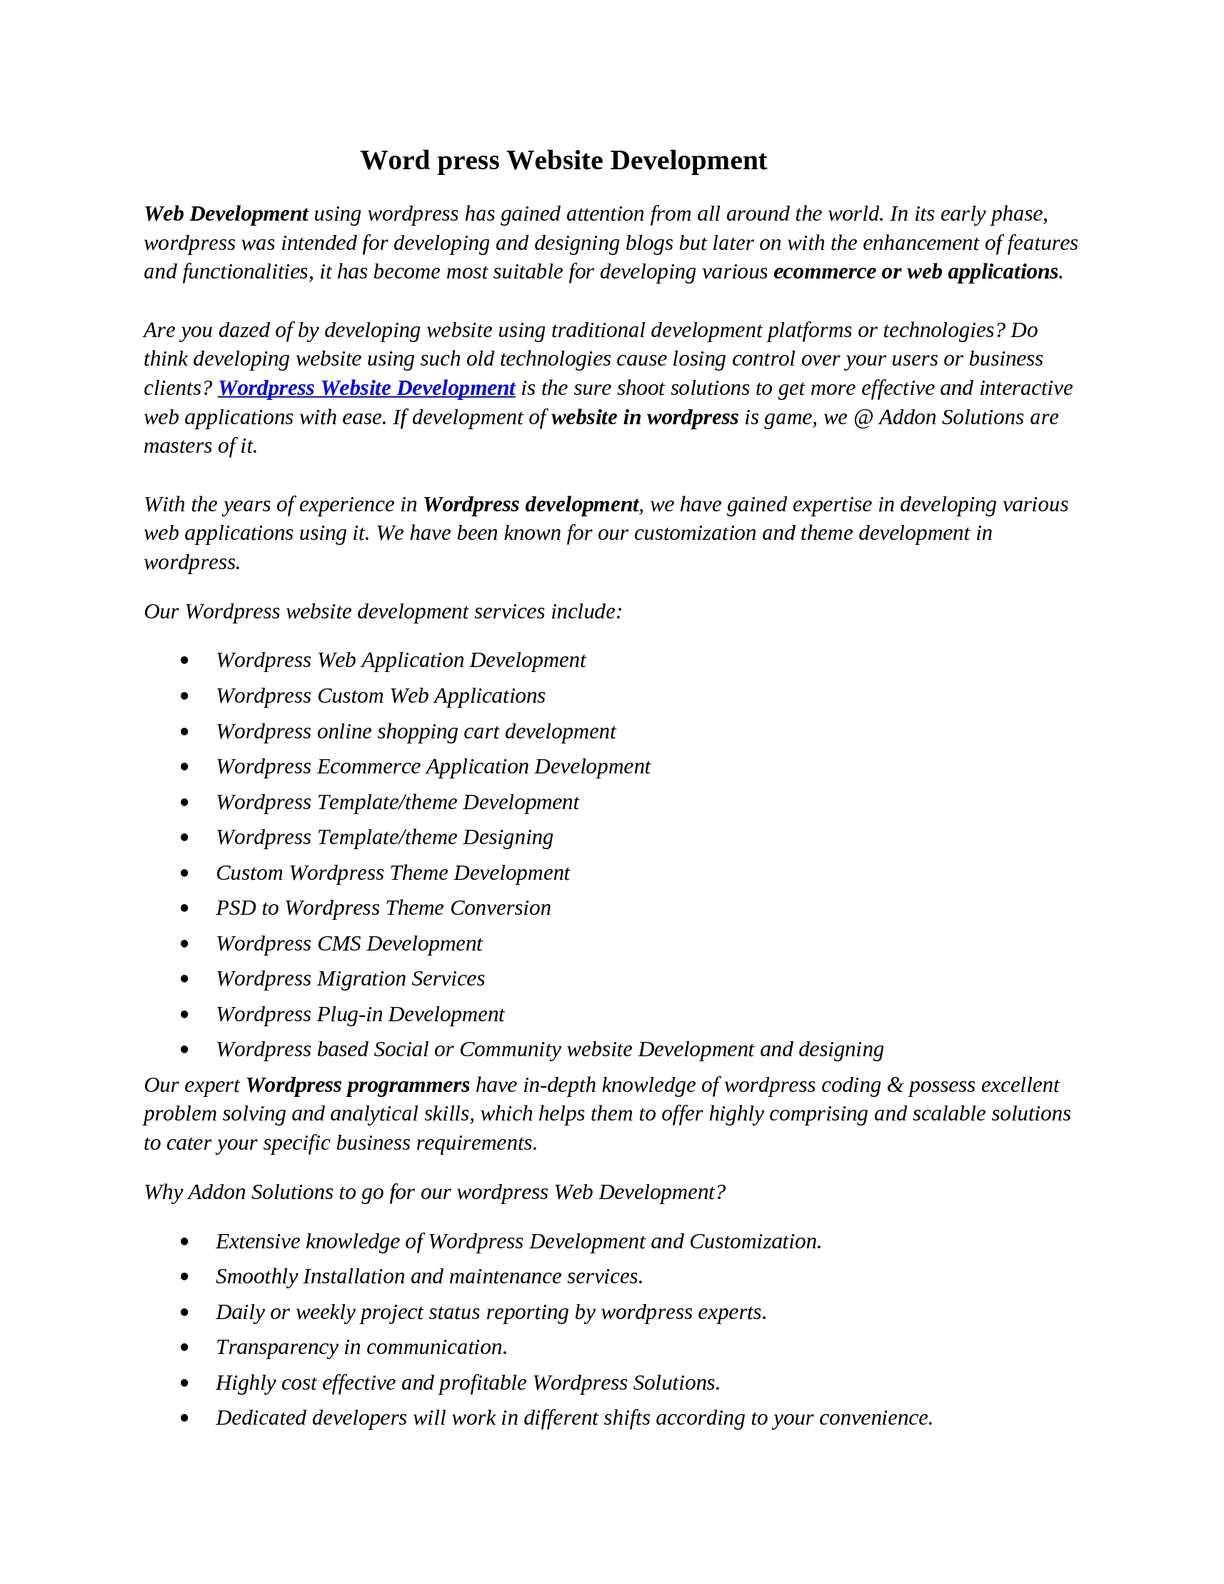 Calaméo - Word Press Website Development